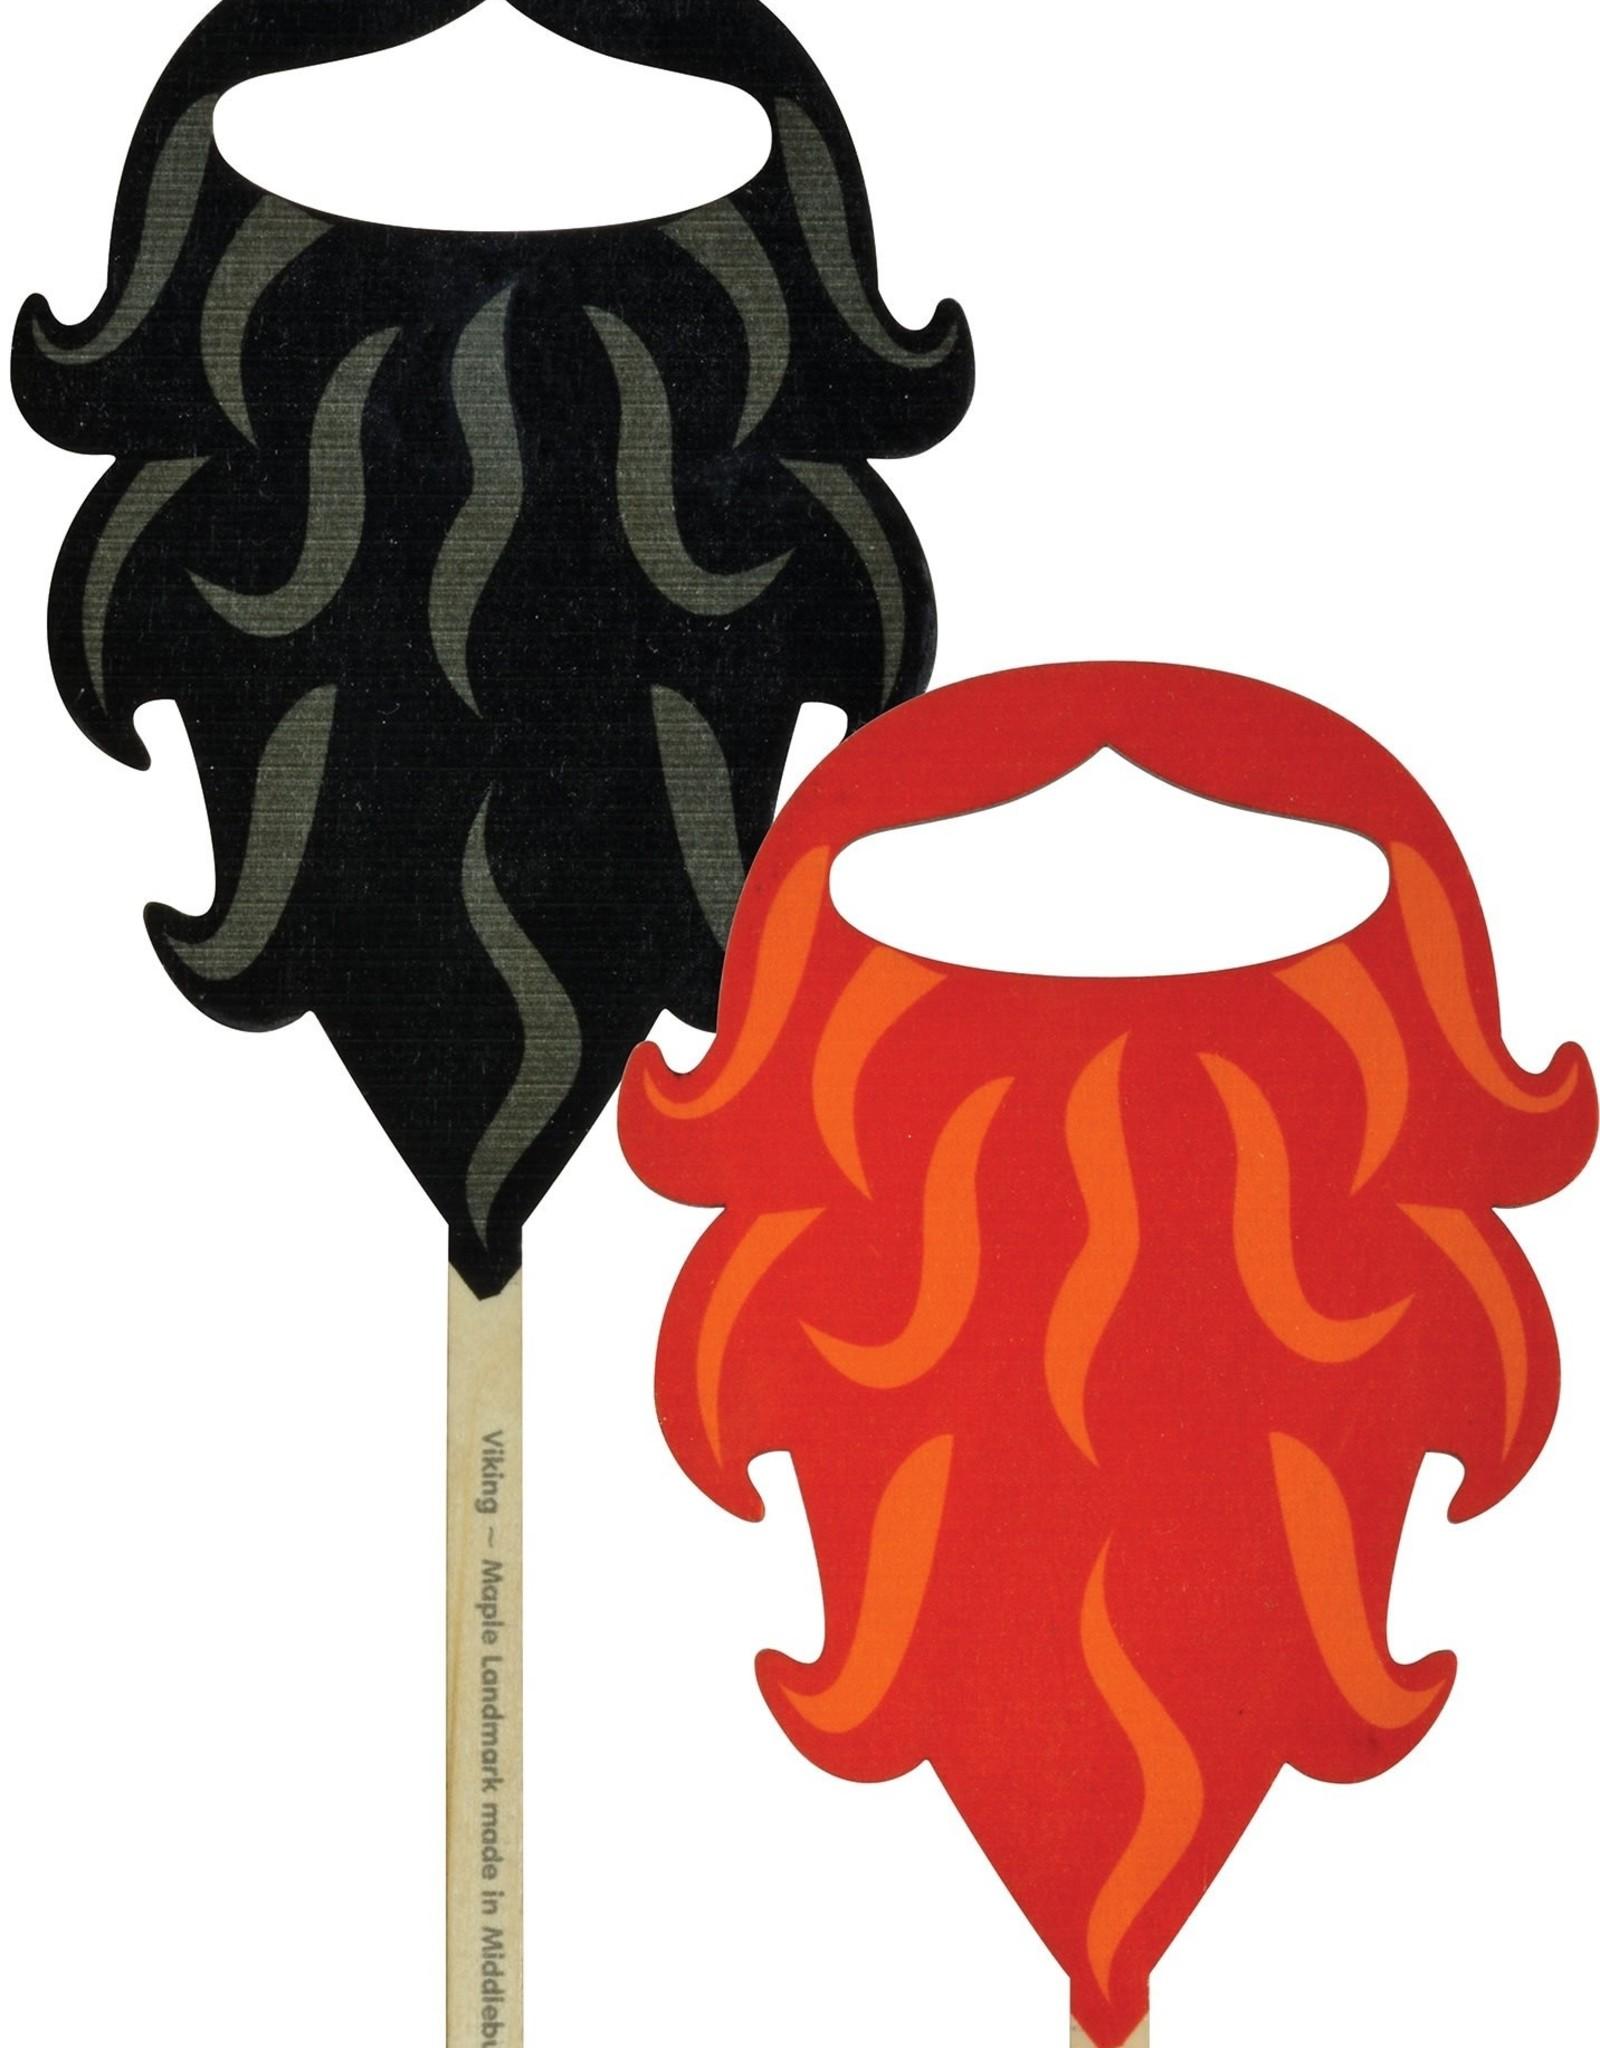 Maple Landmark Silly Sticks Viking Beard